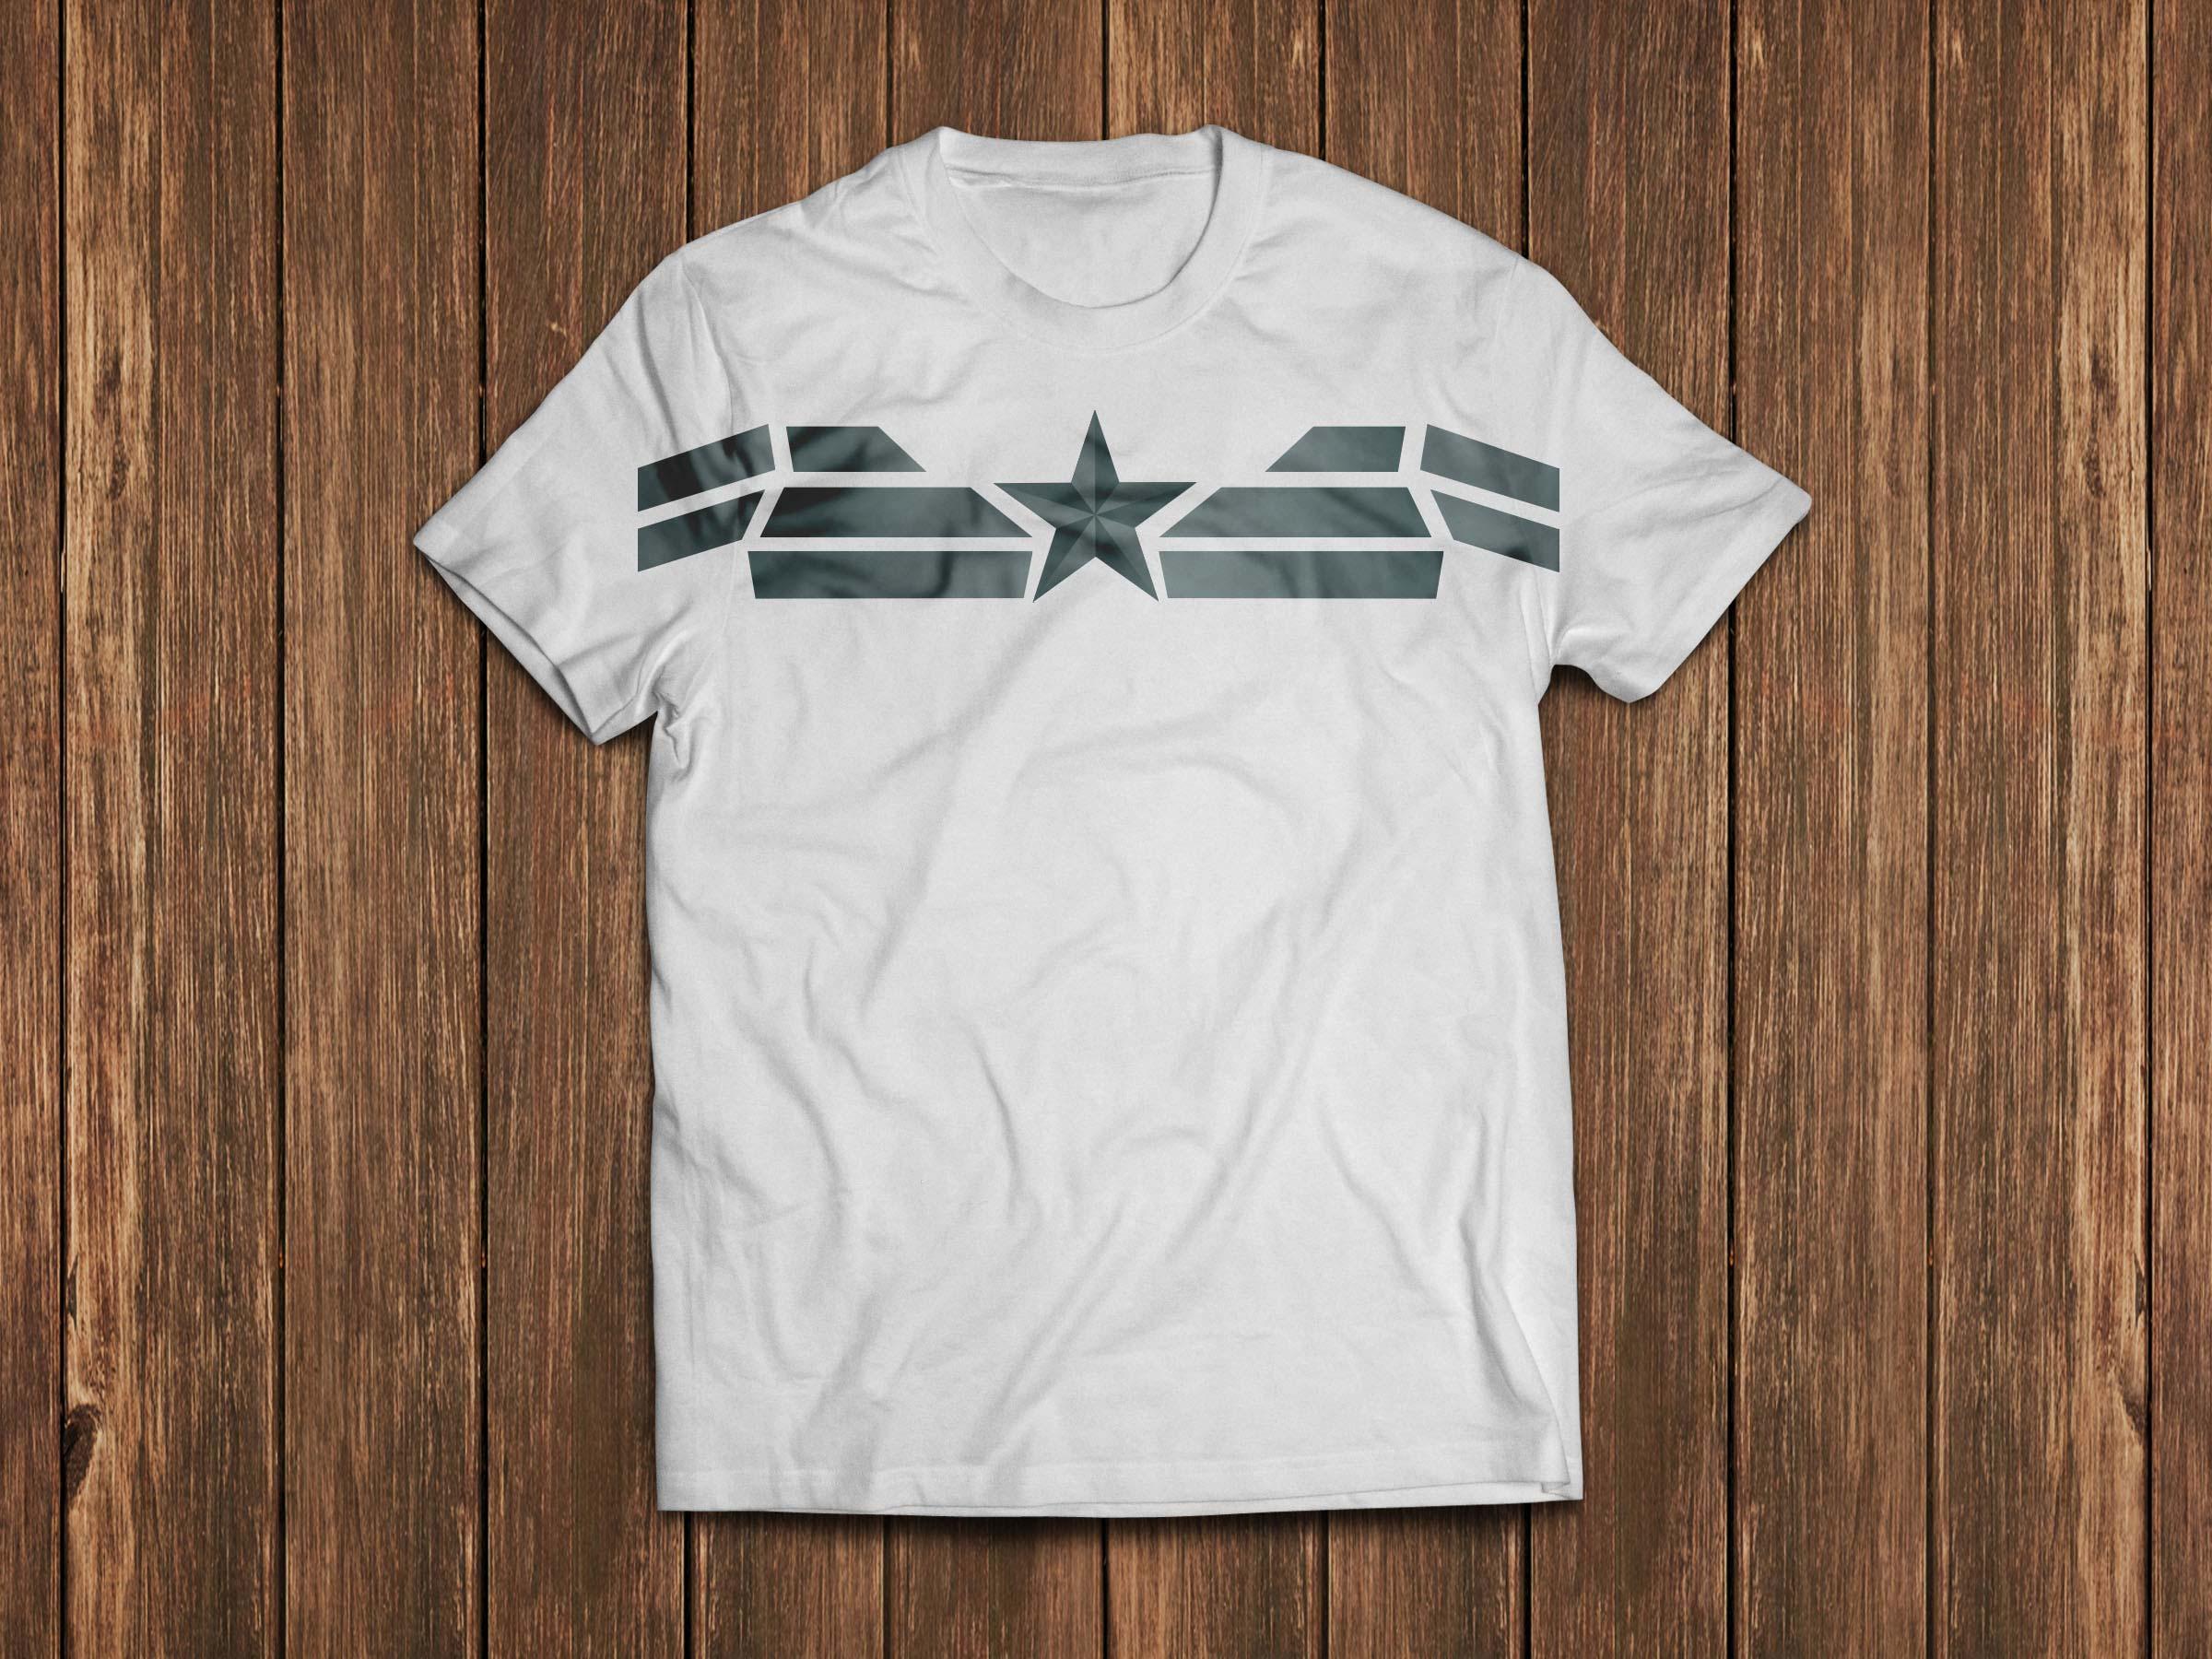 Tshirt design - Captain America The Winter Soldier T Shirt Design